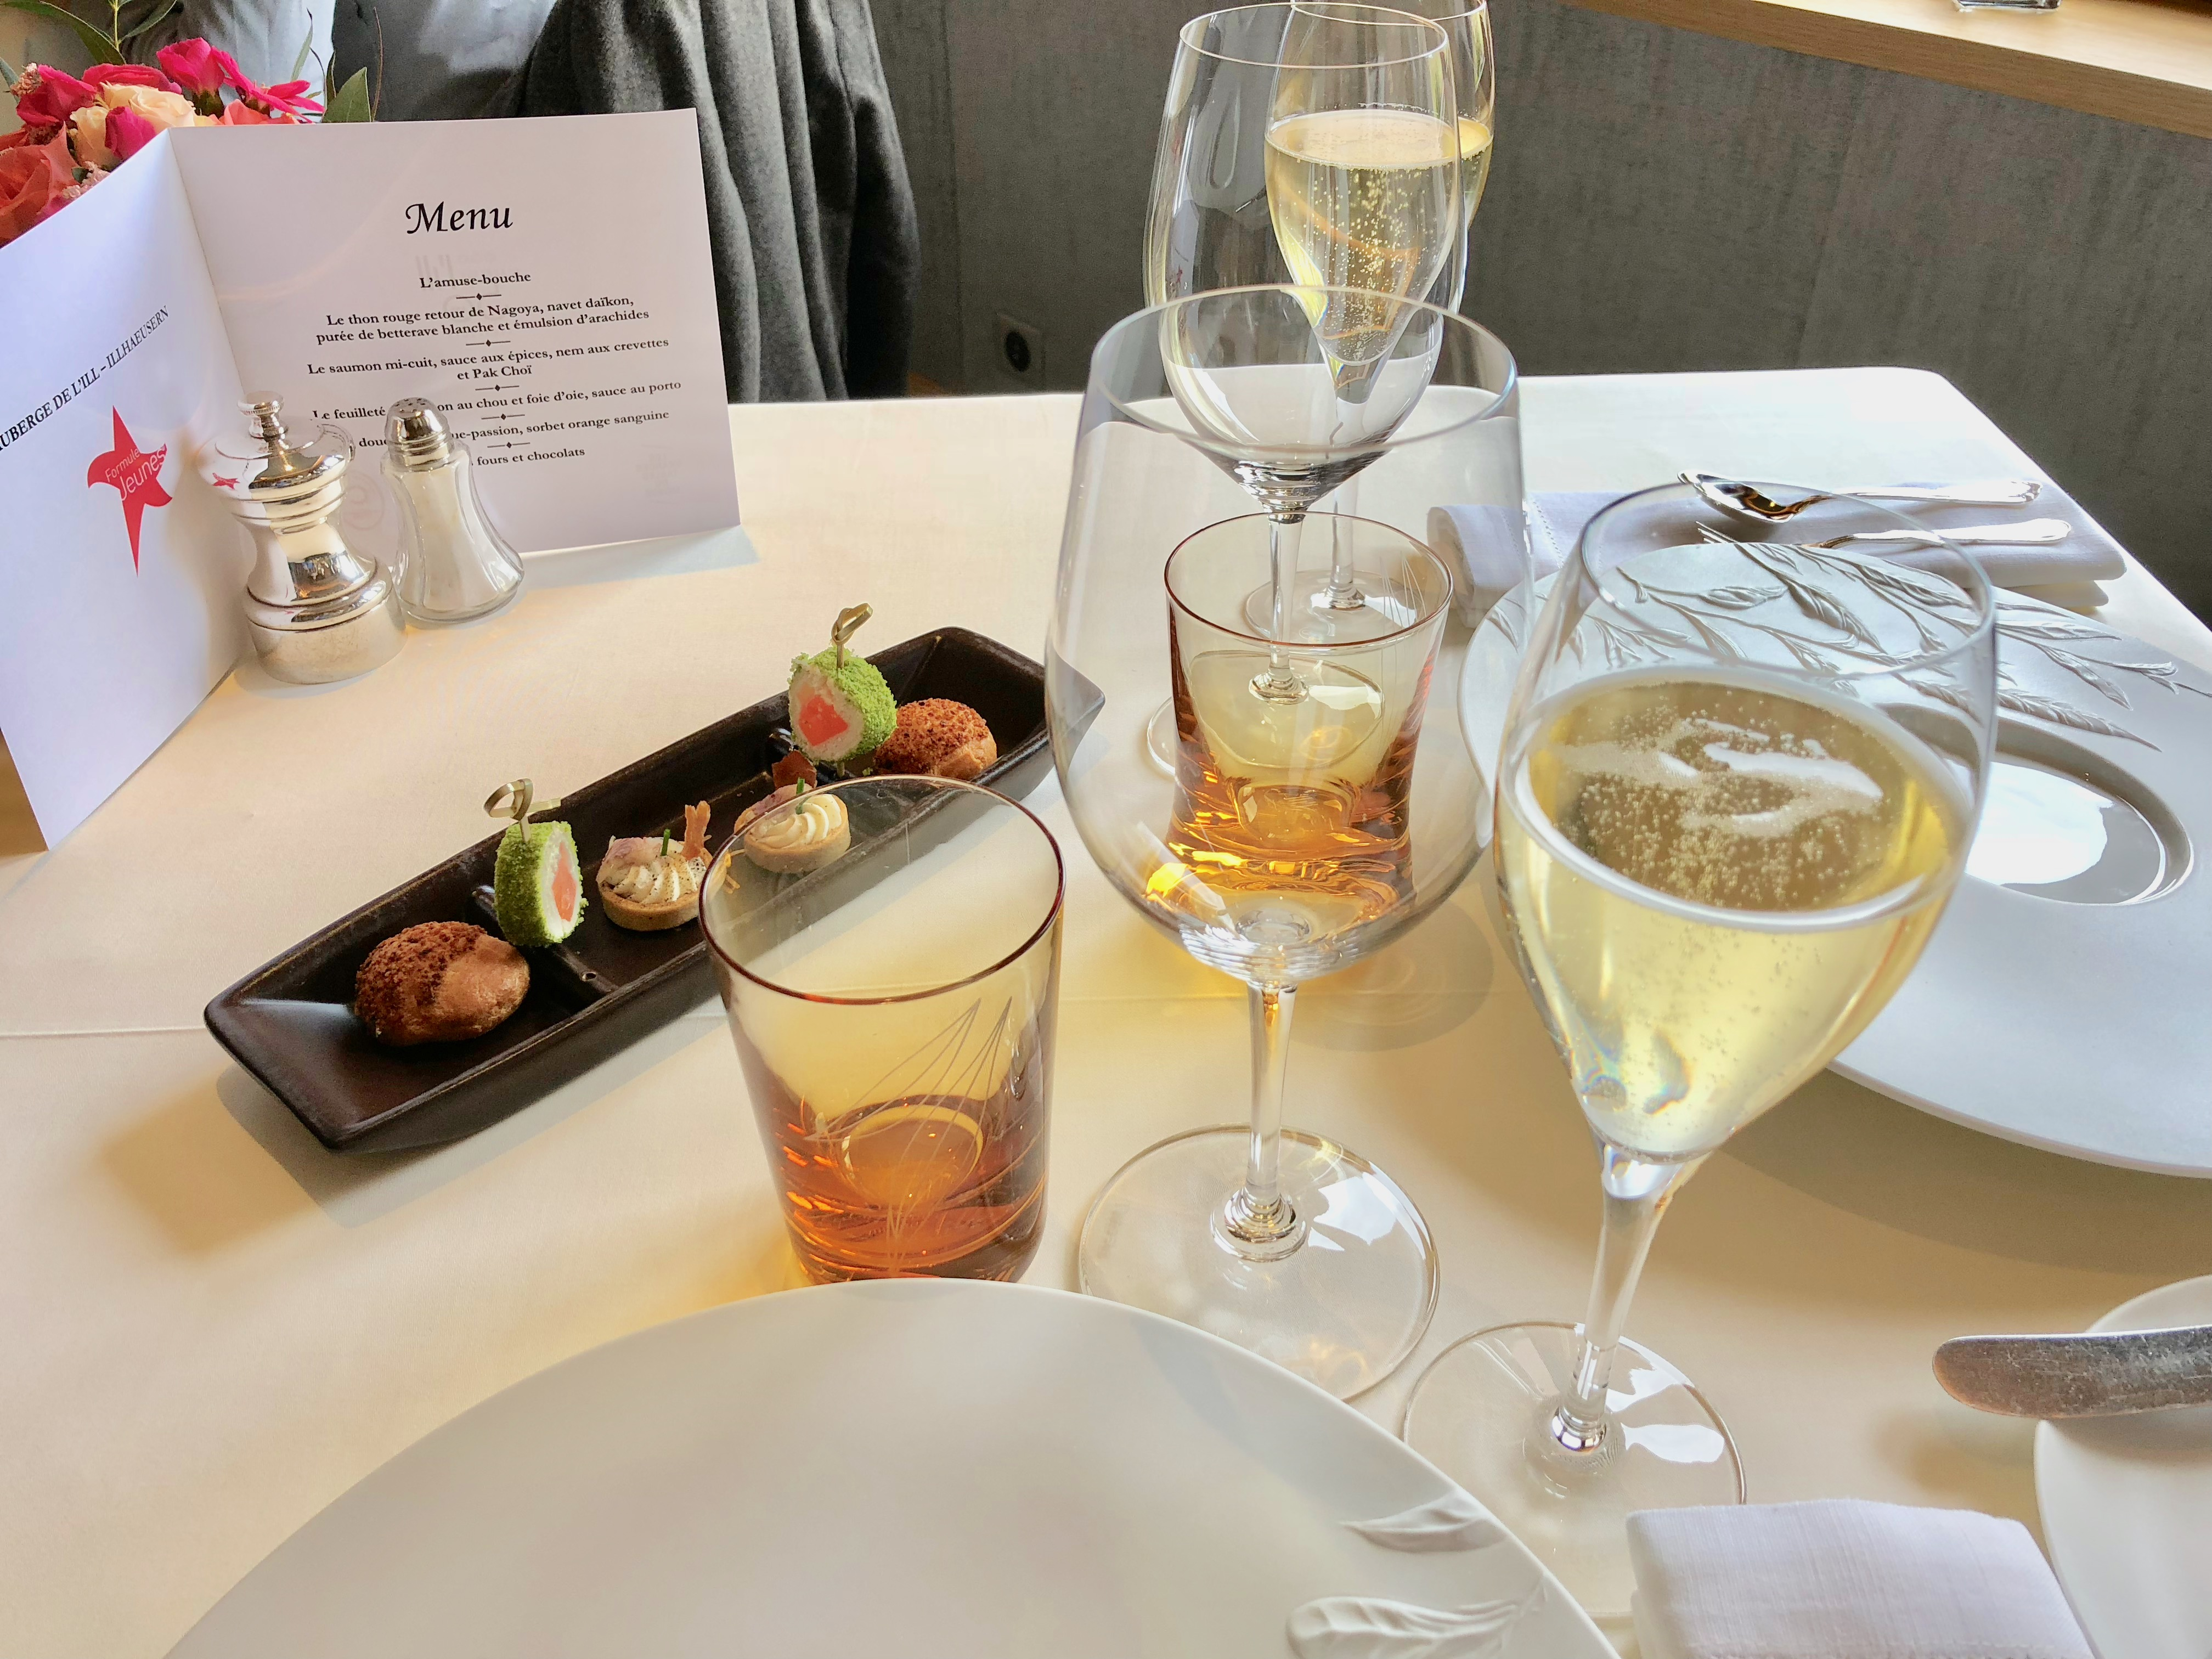 blog-mode-beaute-deco-voyage-recette-lifestyle-strasbourg